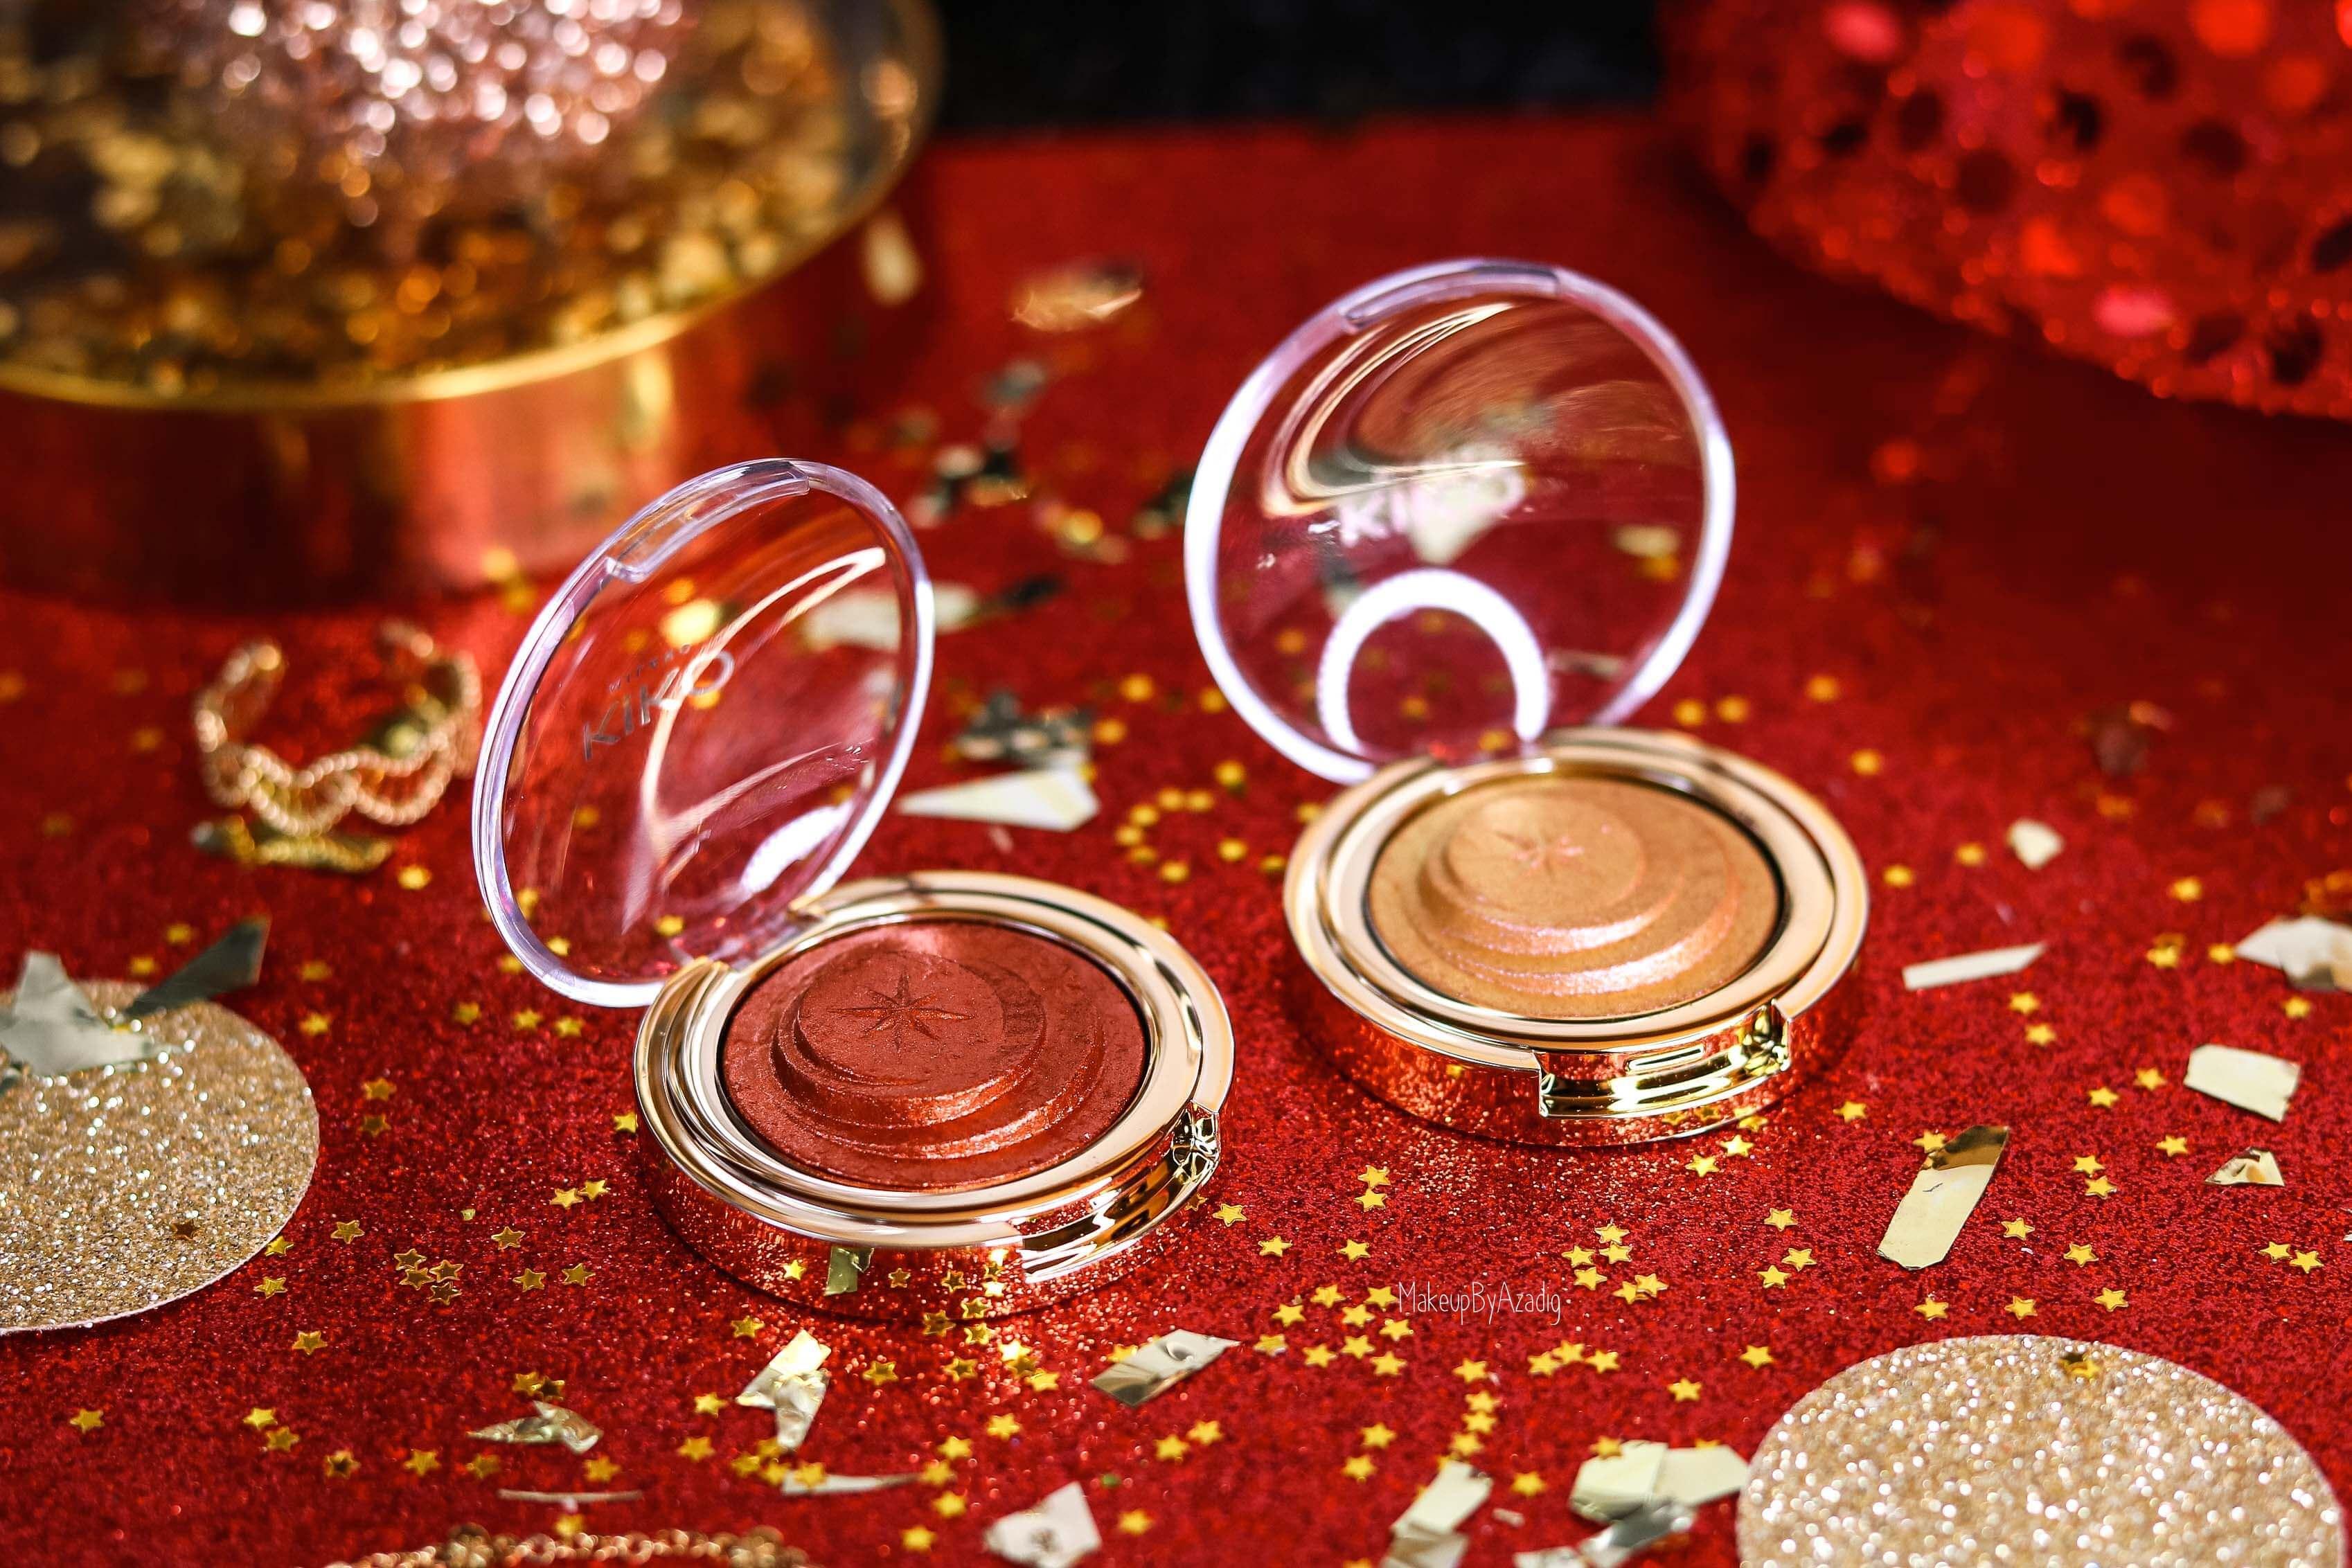 revue-collection-noel-kiko-milano-troyes-magical-holiday-rouge-levres-fard-paupieres-makeupbyazadig-avis-prix-swatch-paillete-2019-shadow